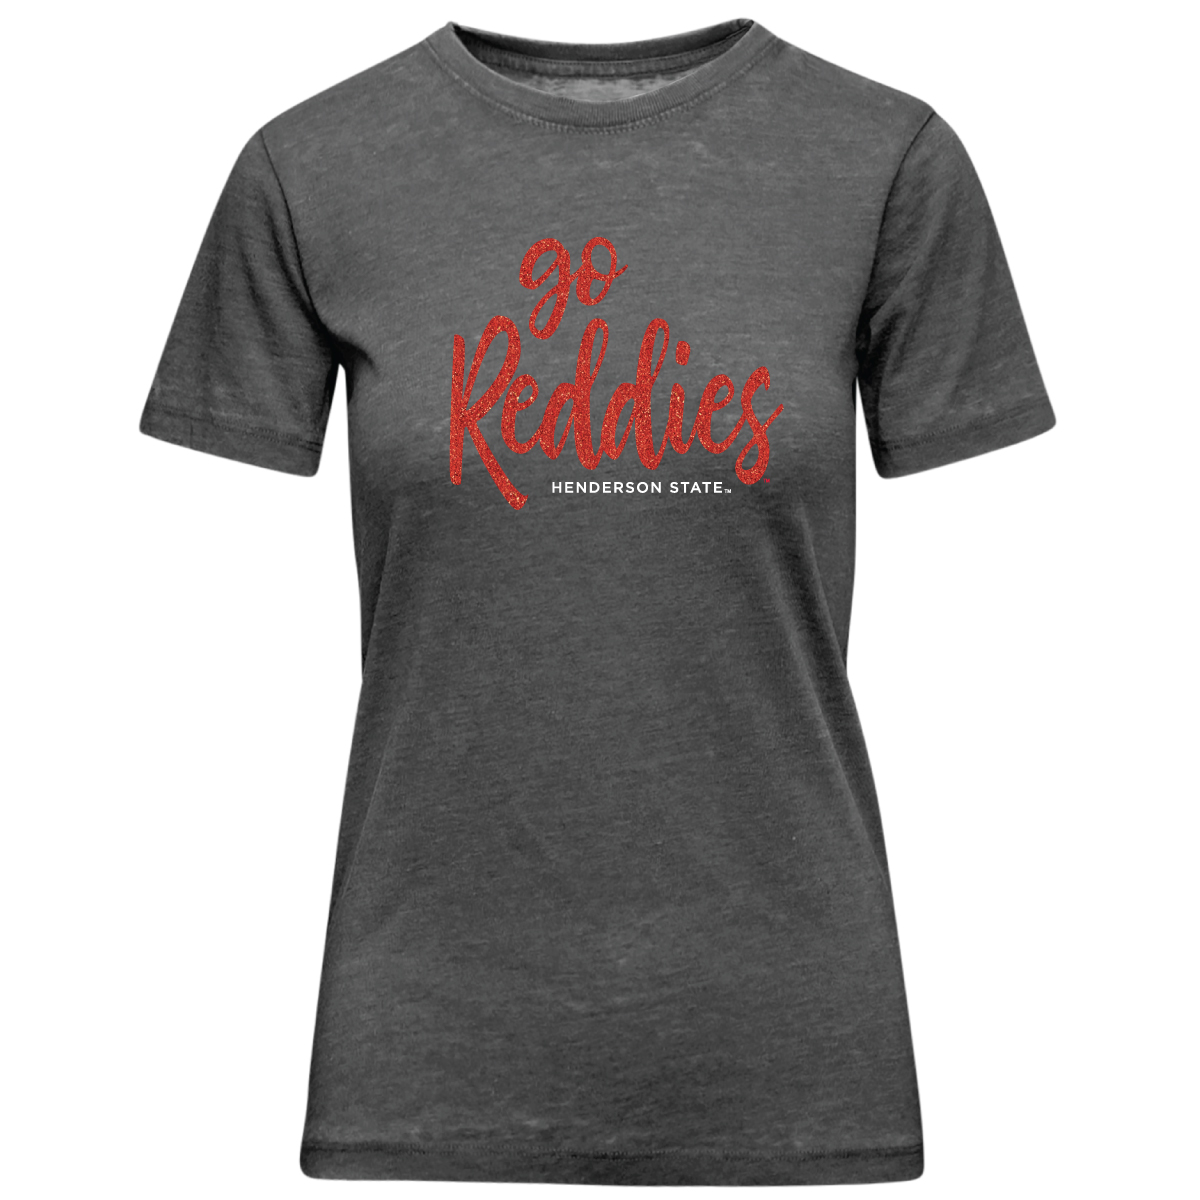 Go Reddies Henderson State Sparkle Encore Short Sleeve T-Shirt